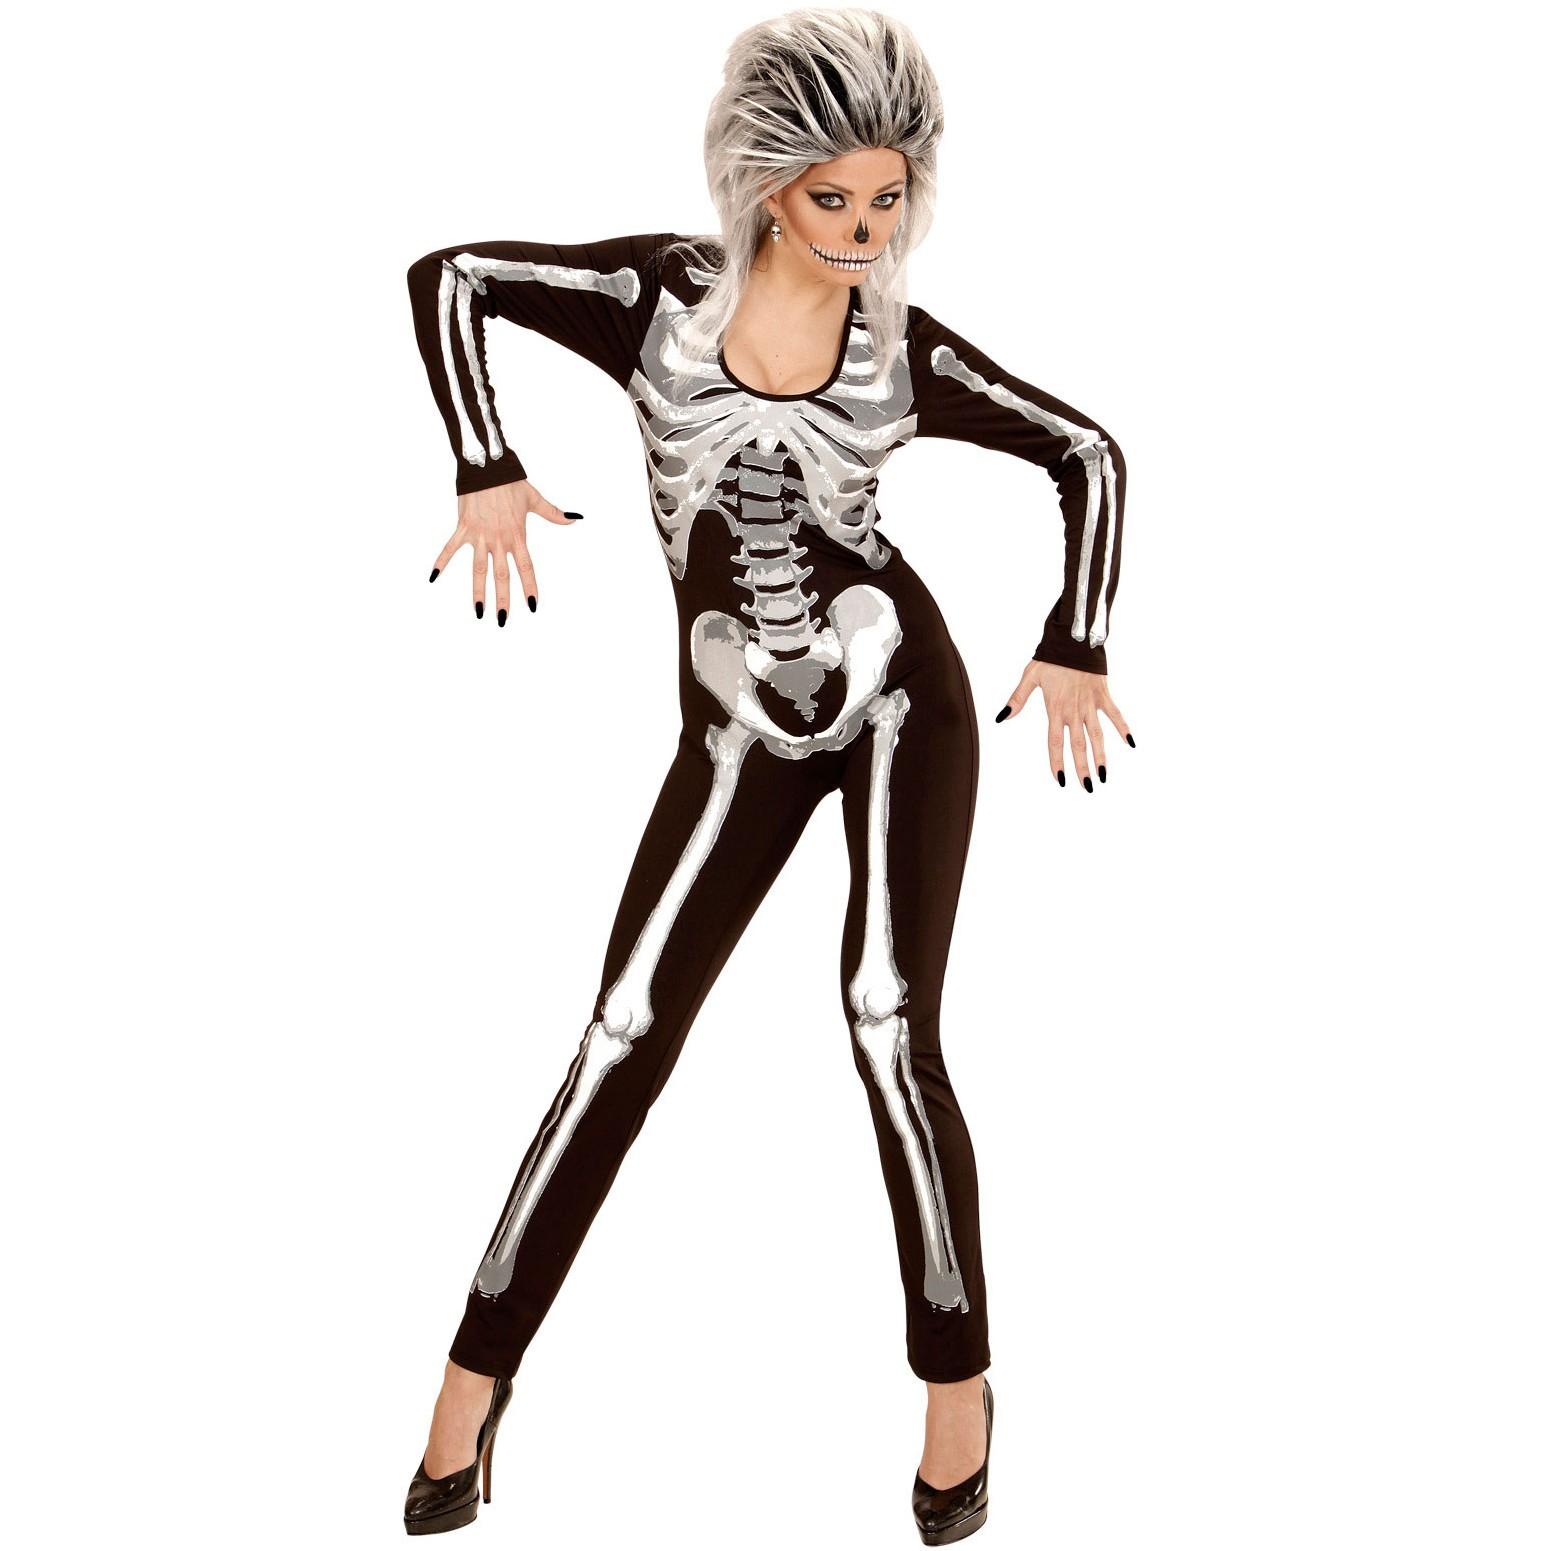 Halloween Kostüm Damen Skelett Luxus Skelett Girl Overall Kostm